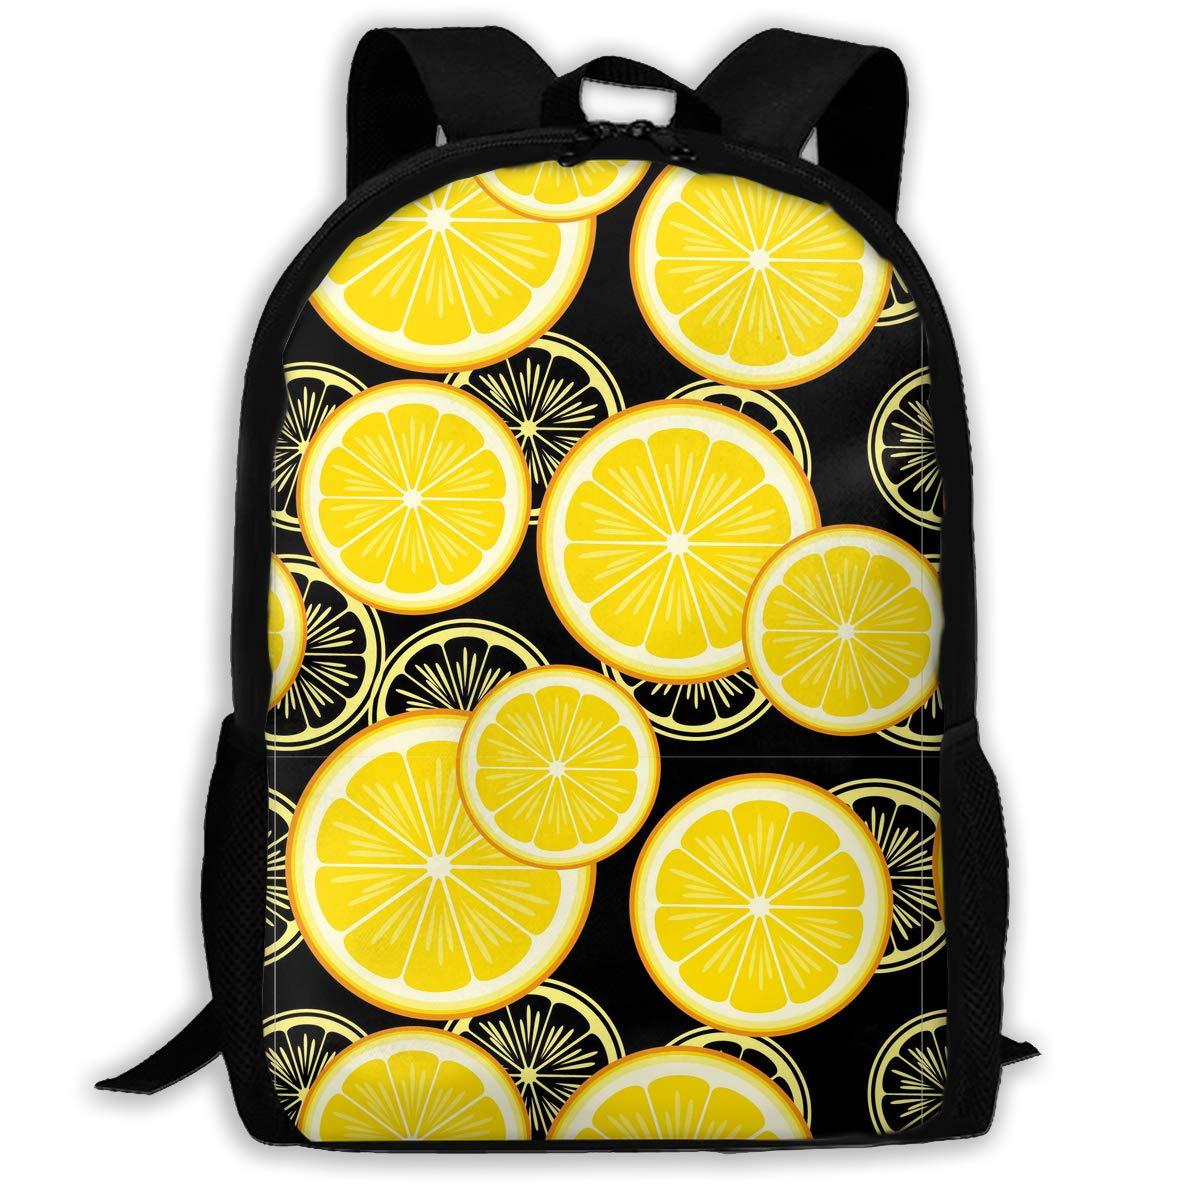 TAOHJS106 Lemons Pattern Waterproof Adult Backpack Shoulder Bag for Women  and Men Premium Durable Rucksack Bookbag Best for Athletic b020794716